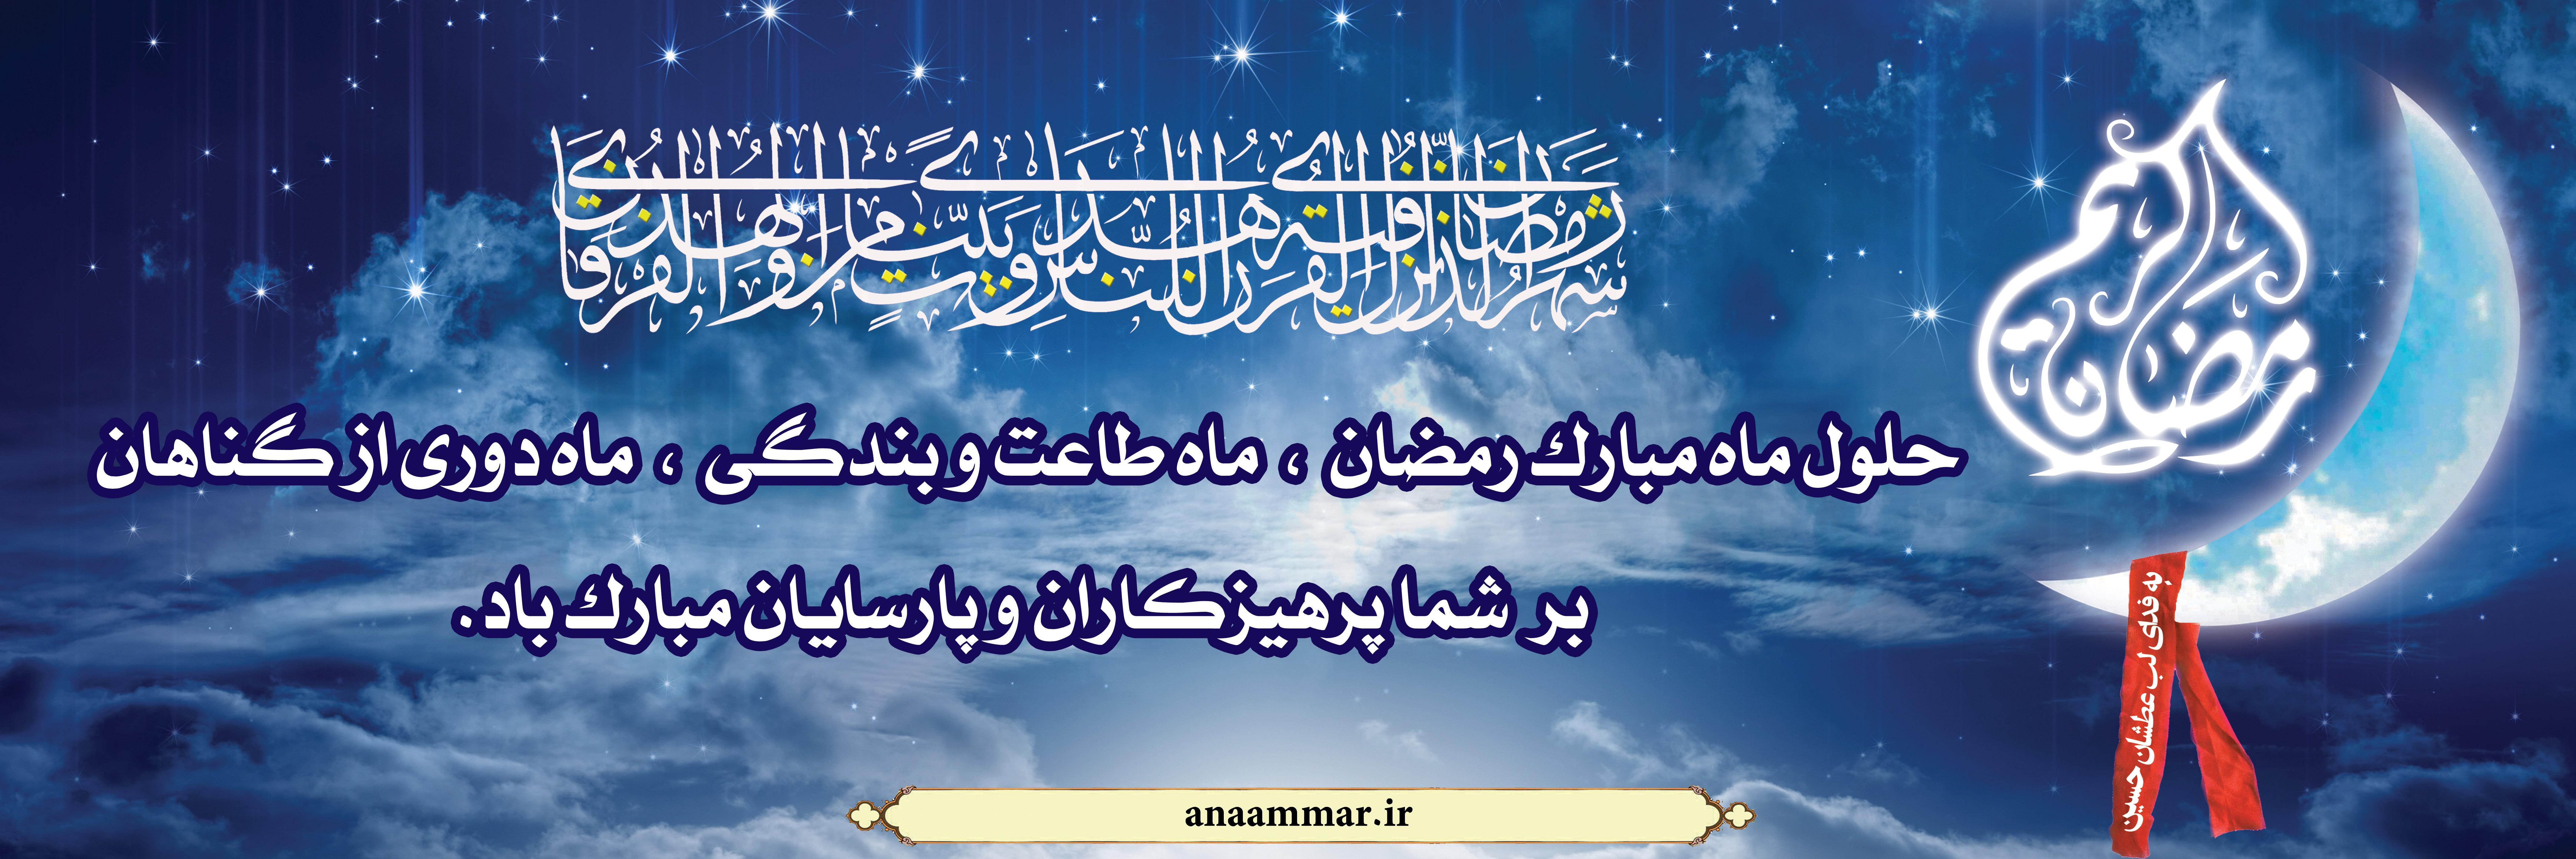 http://s3.picofile.com/file/8192528618/pelakarde_mahe_ramezan_94_1.jpg